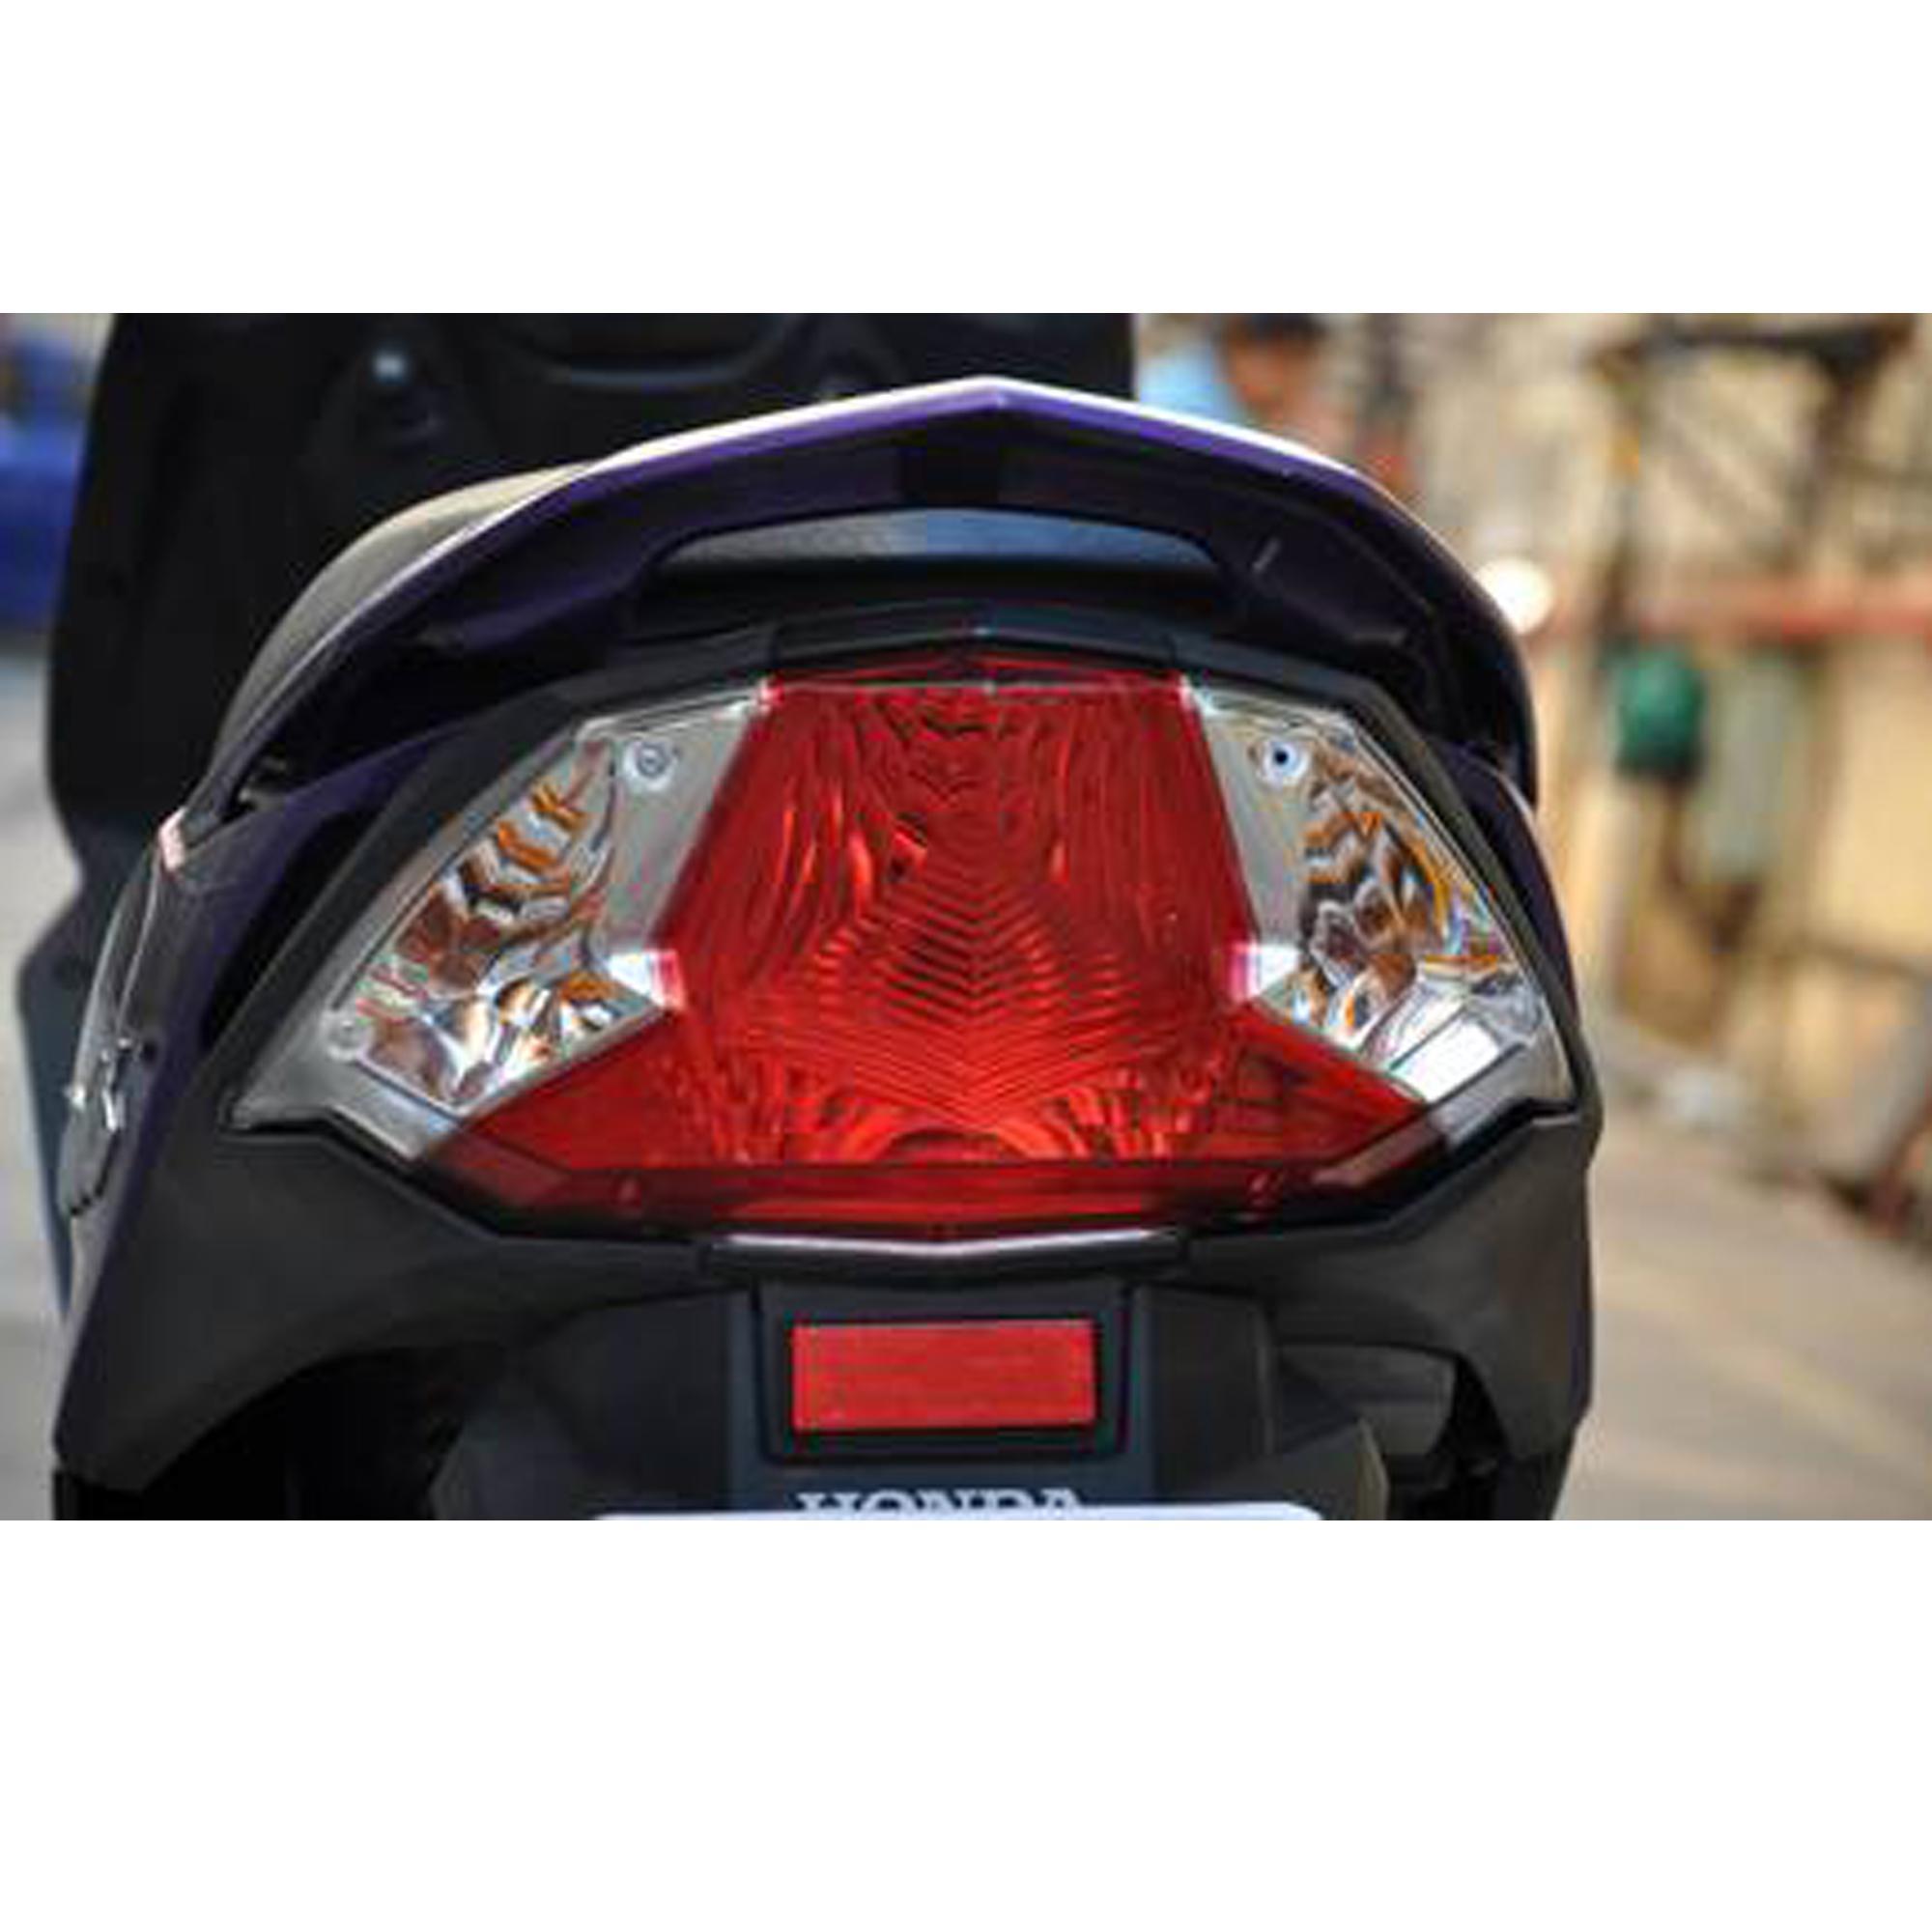 Motorbike Modification Parts in Sri Lanka | Bike Parts Price